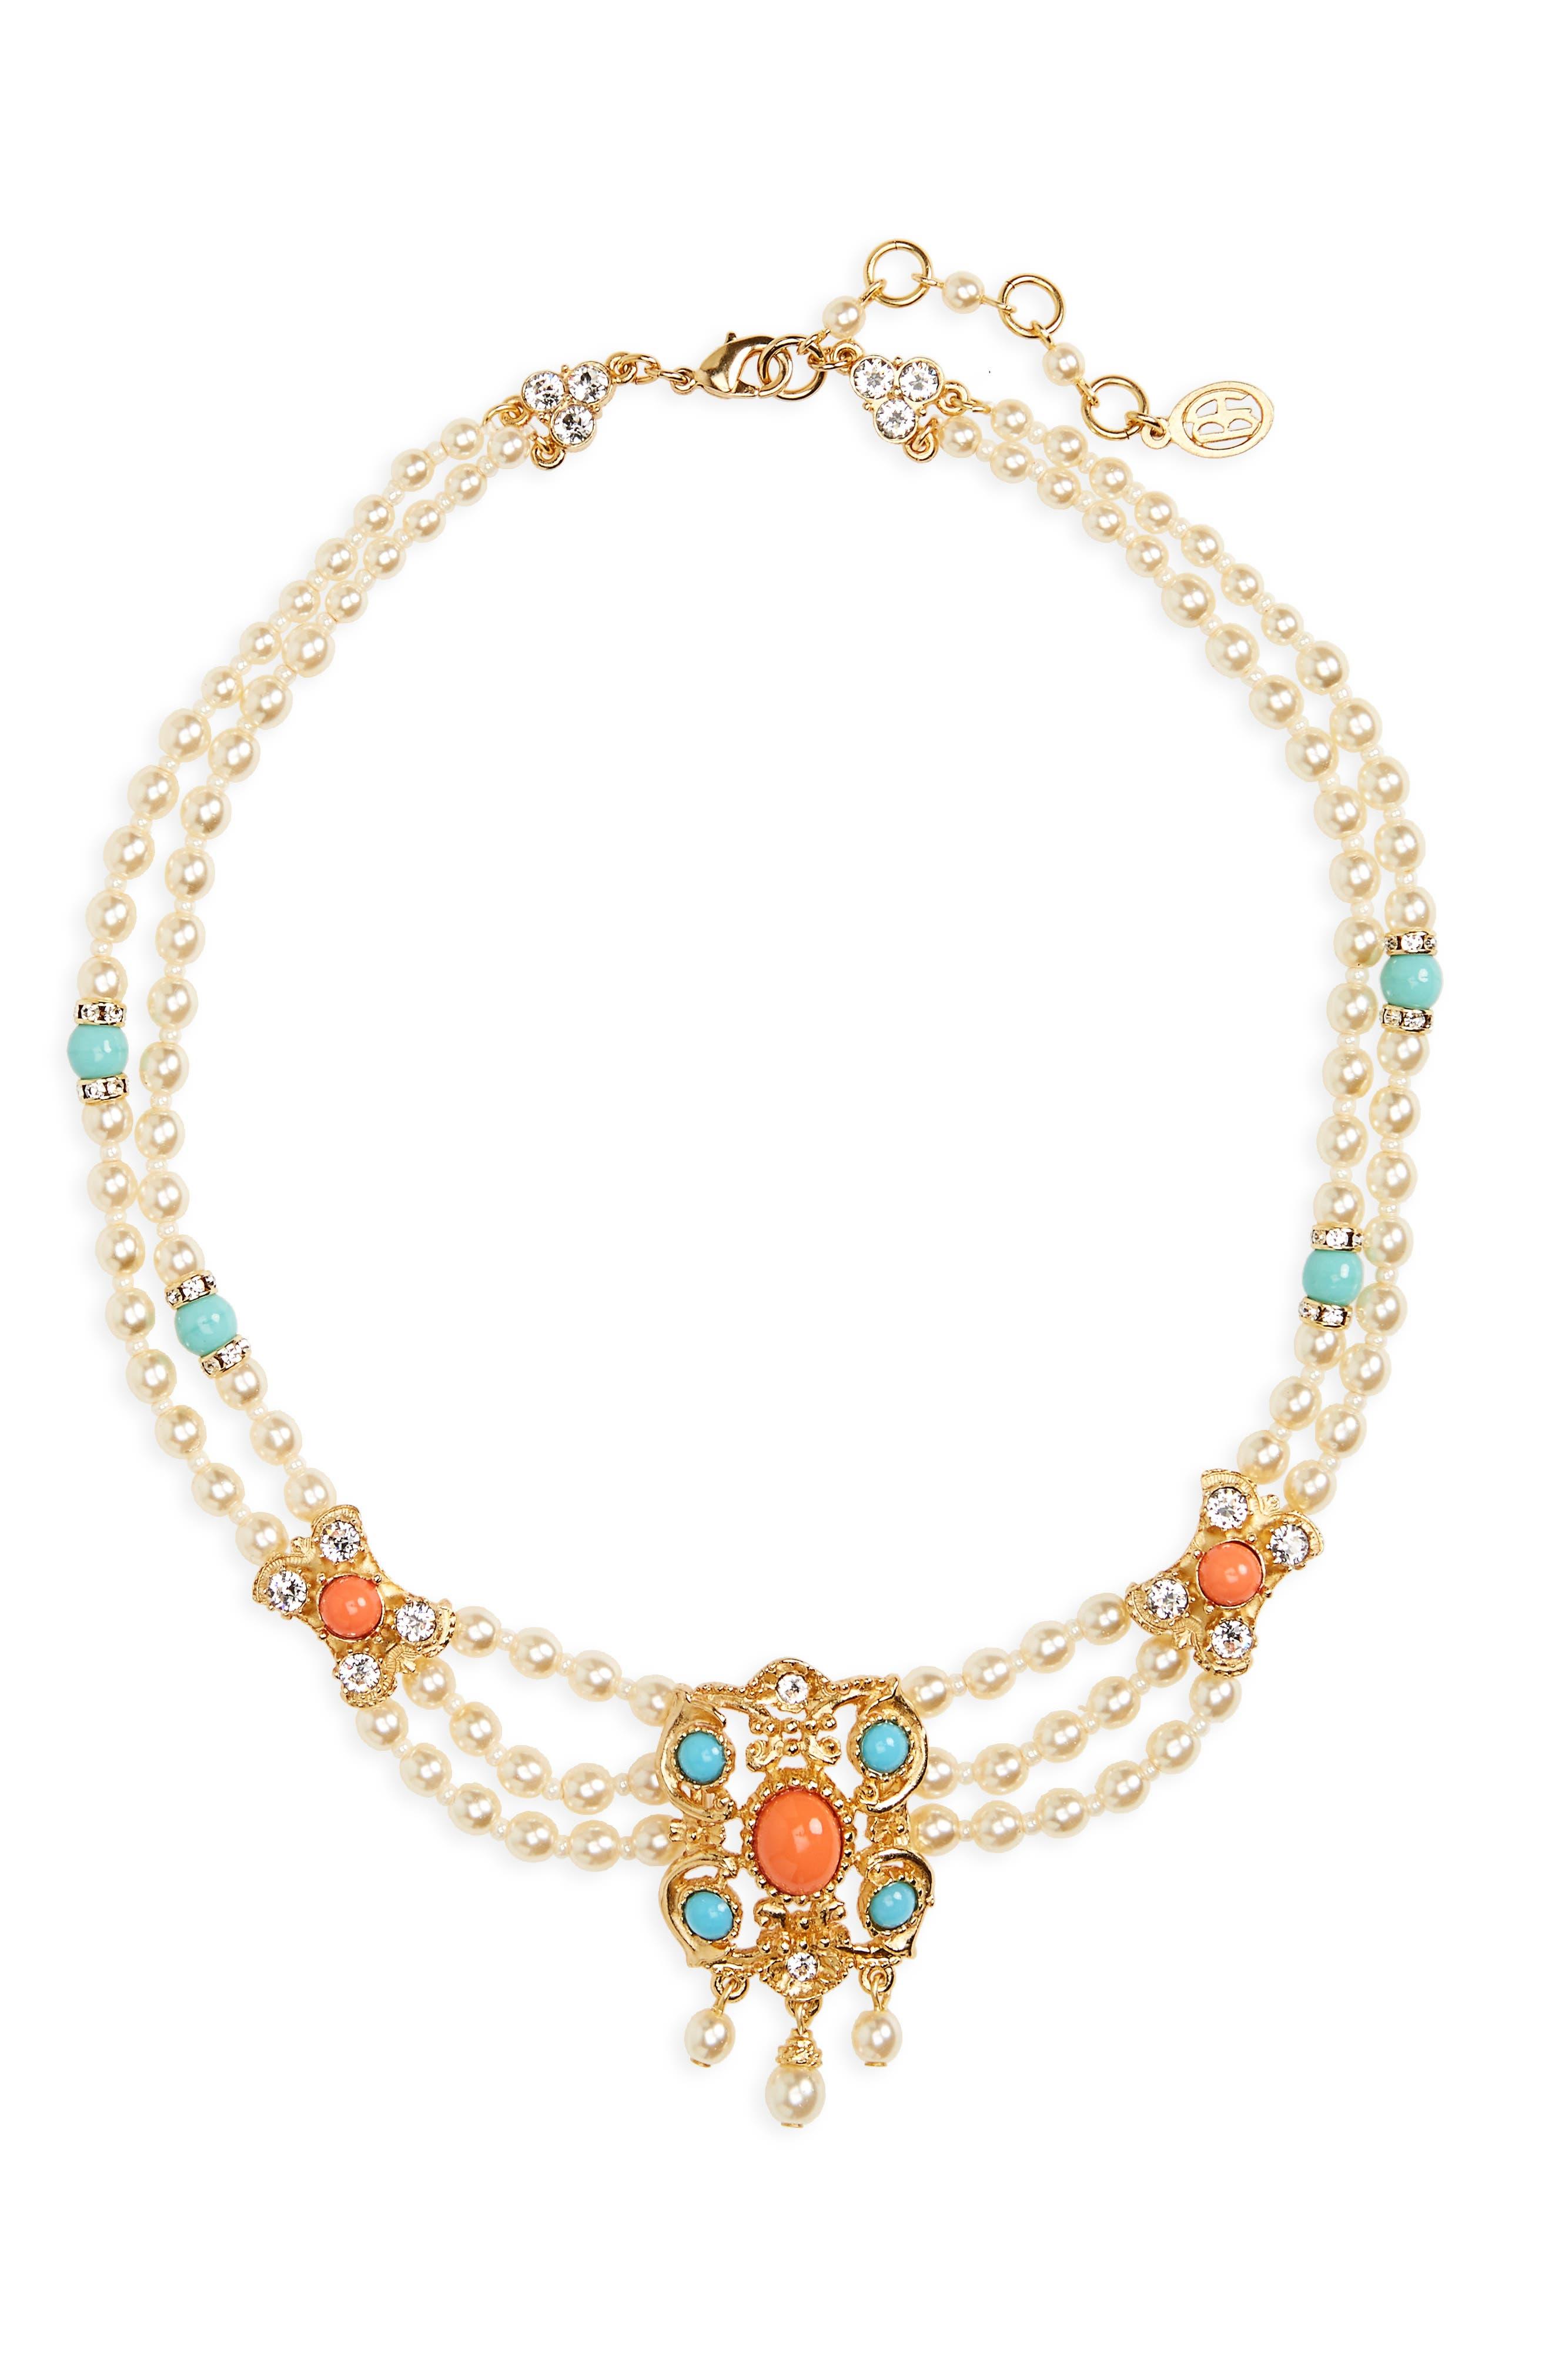 Main Image - Ben-Amun Adriatic Sea Imitation Pearl Drop Necklace